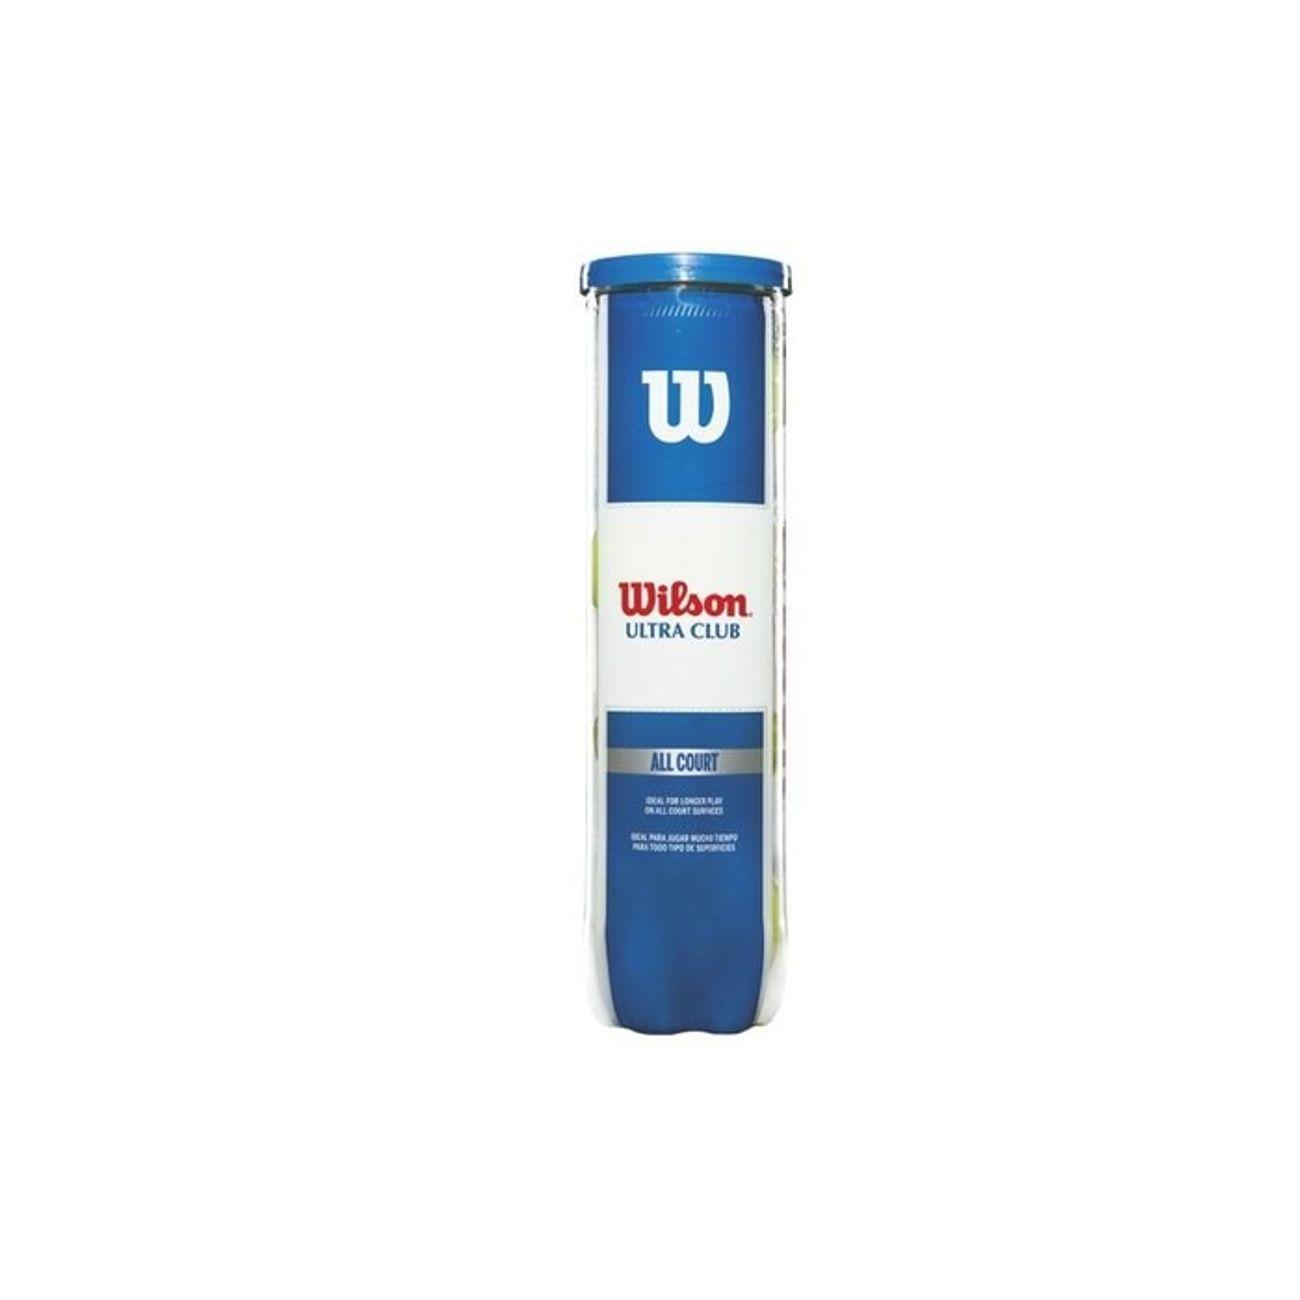 BALLE Tennis  WILSON ULTRA CLUB ALL COURT